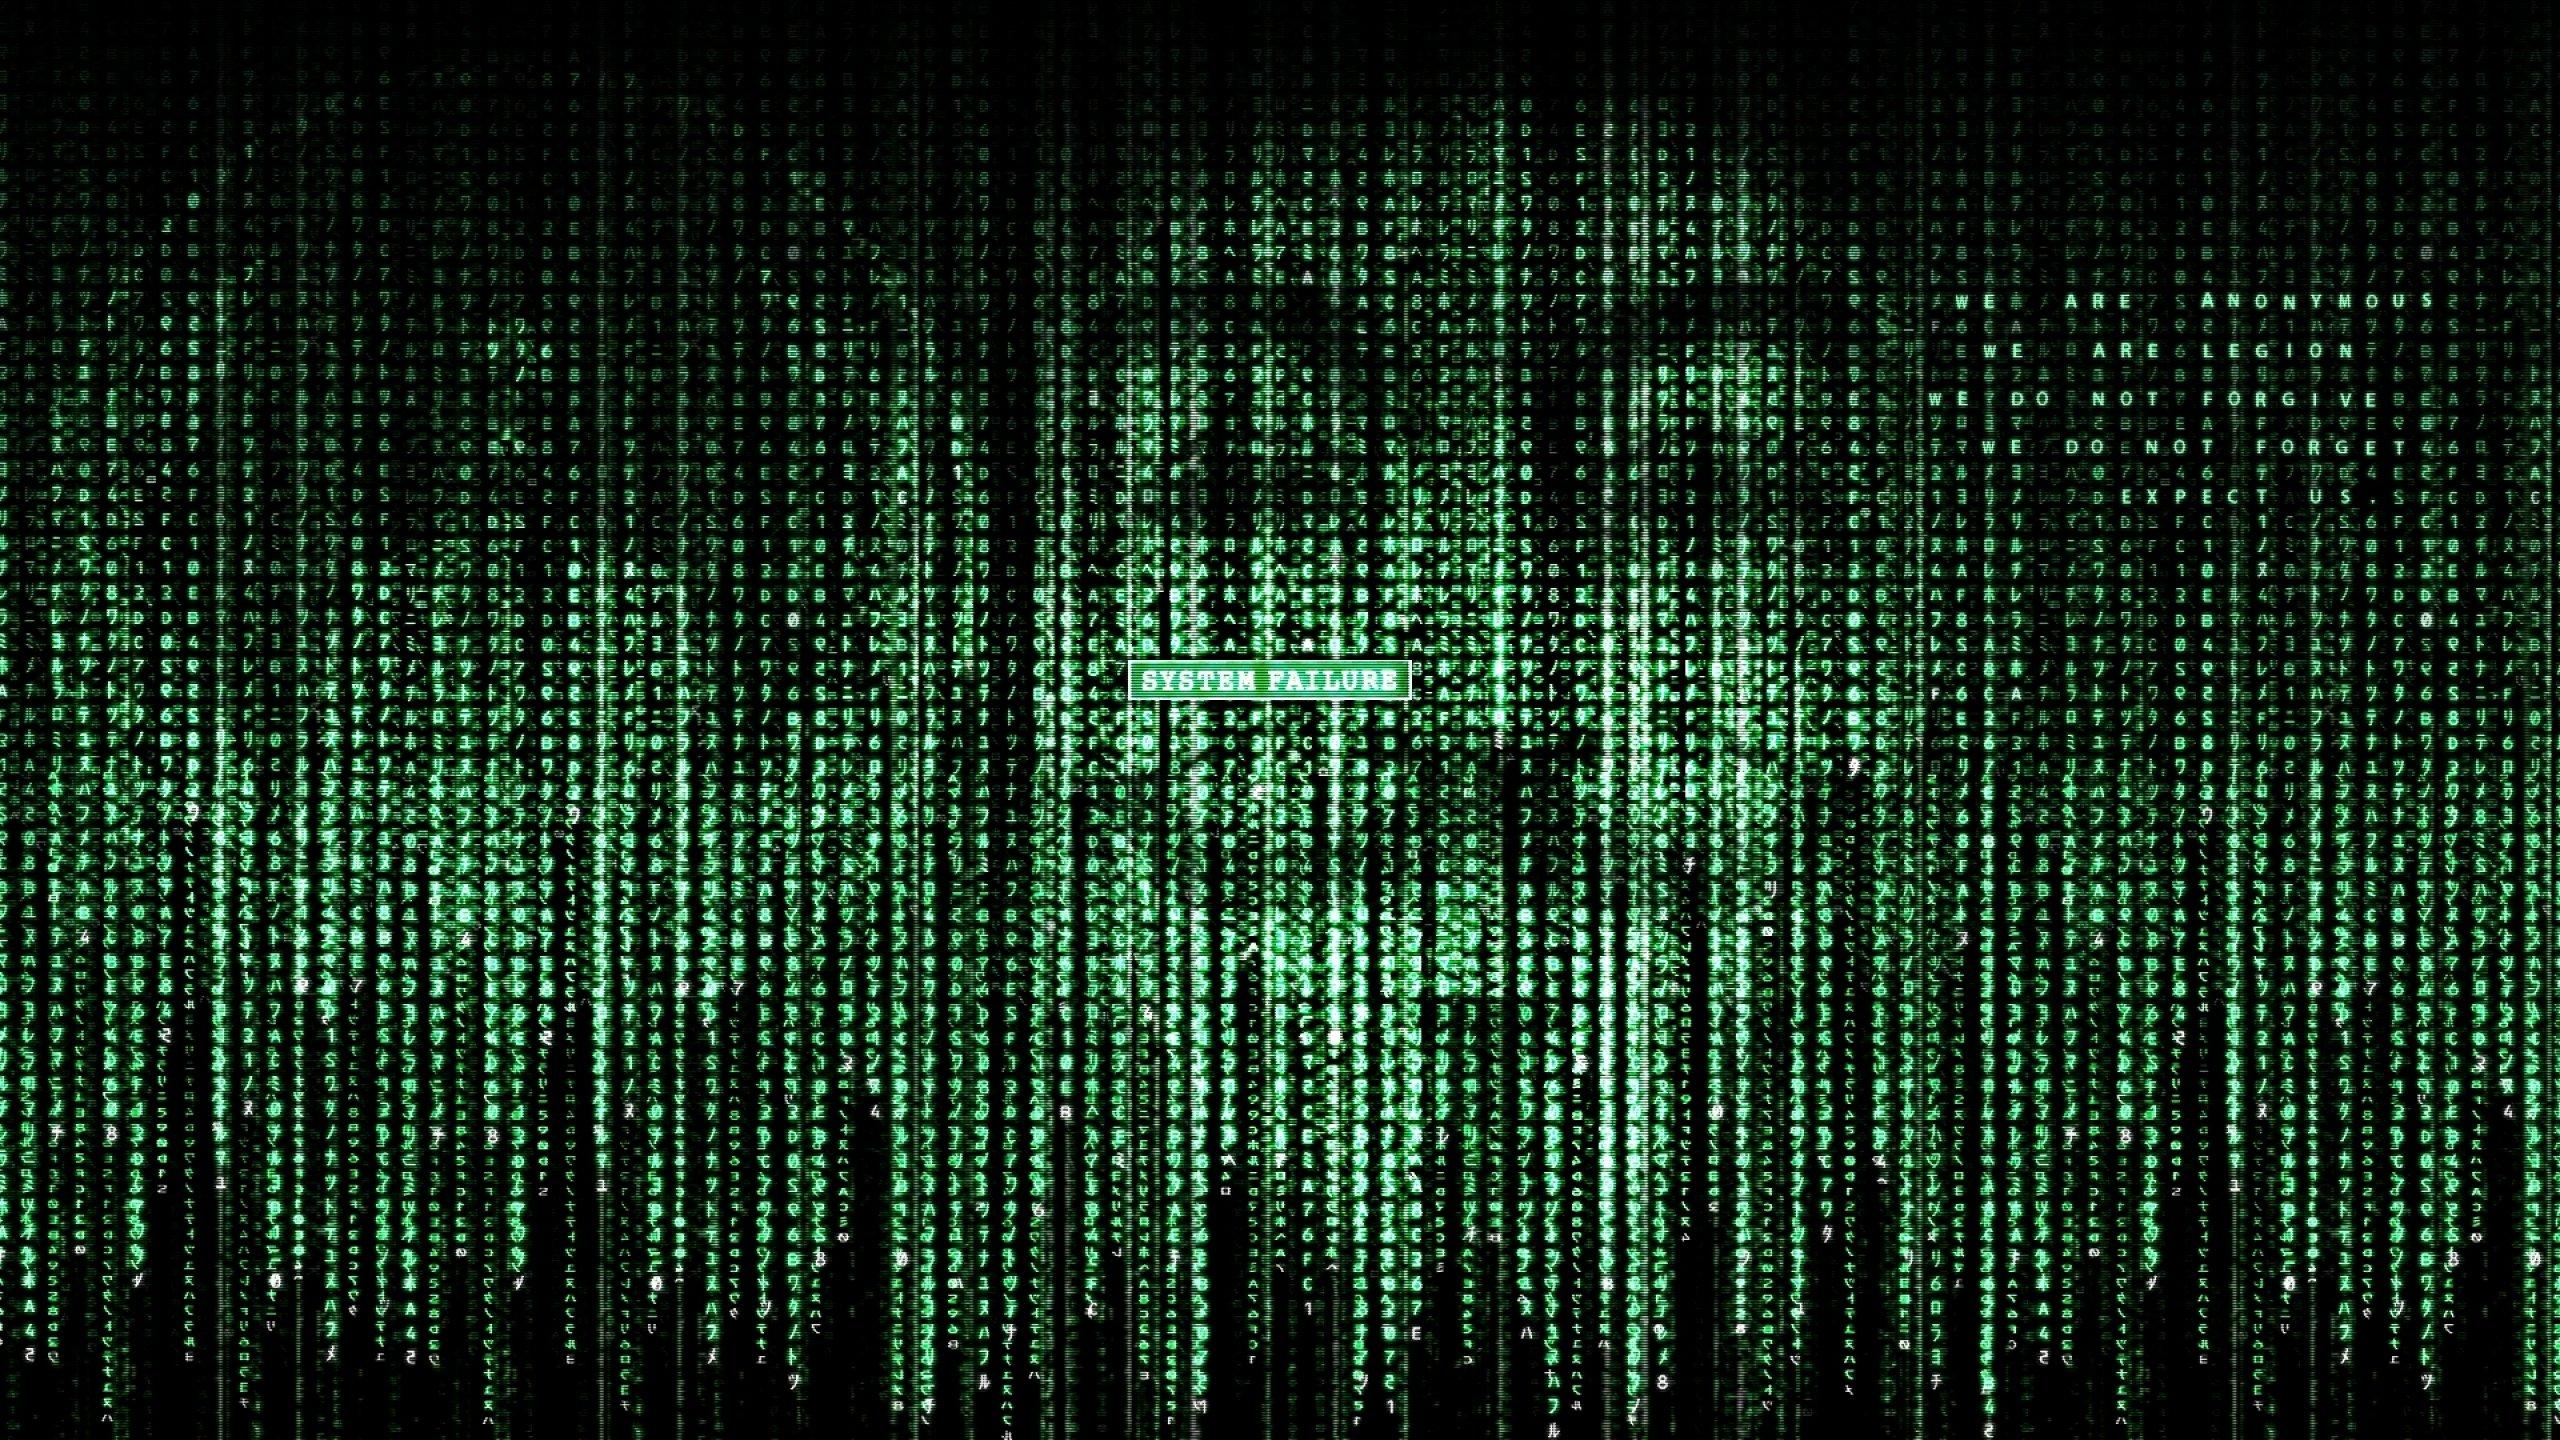 Hack hacking hacker virus anarchy dark computer internet anonymous 2560x1440